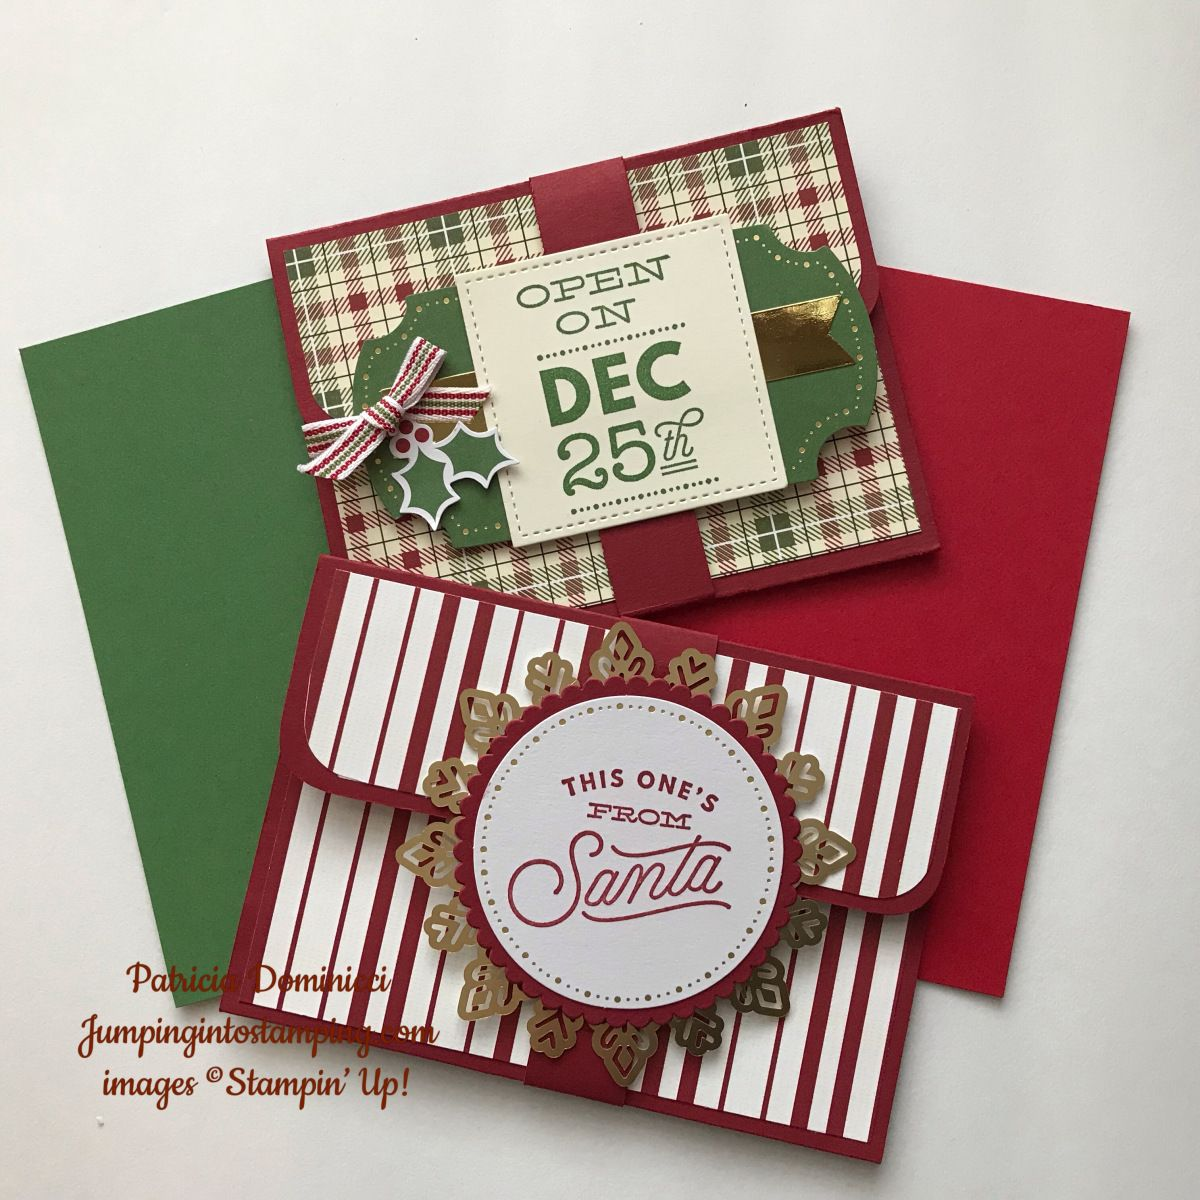 Diy Christmas Gift Card Holder: Christmas Gift Week - More Gift Card Holders